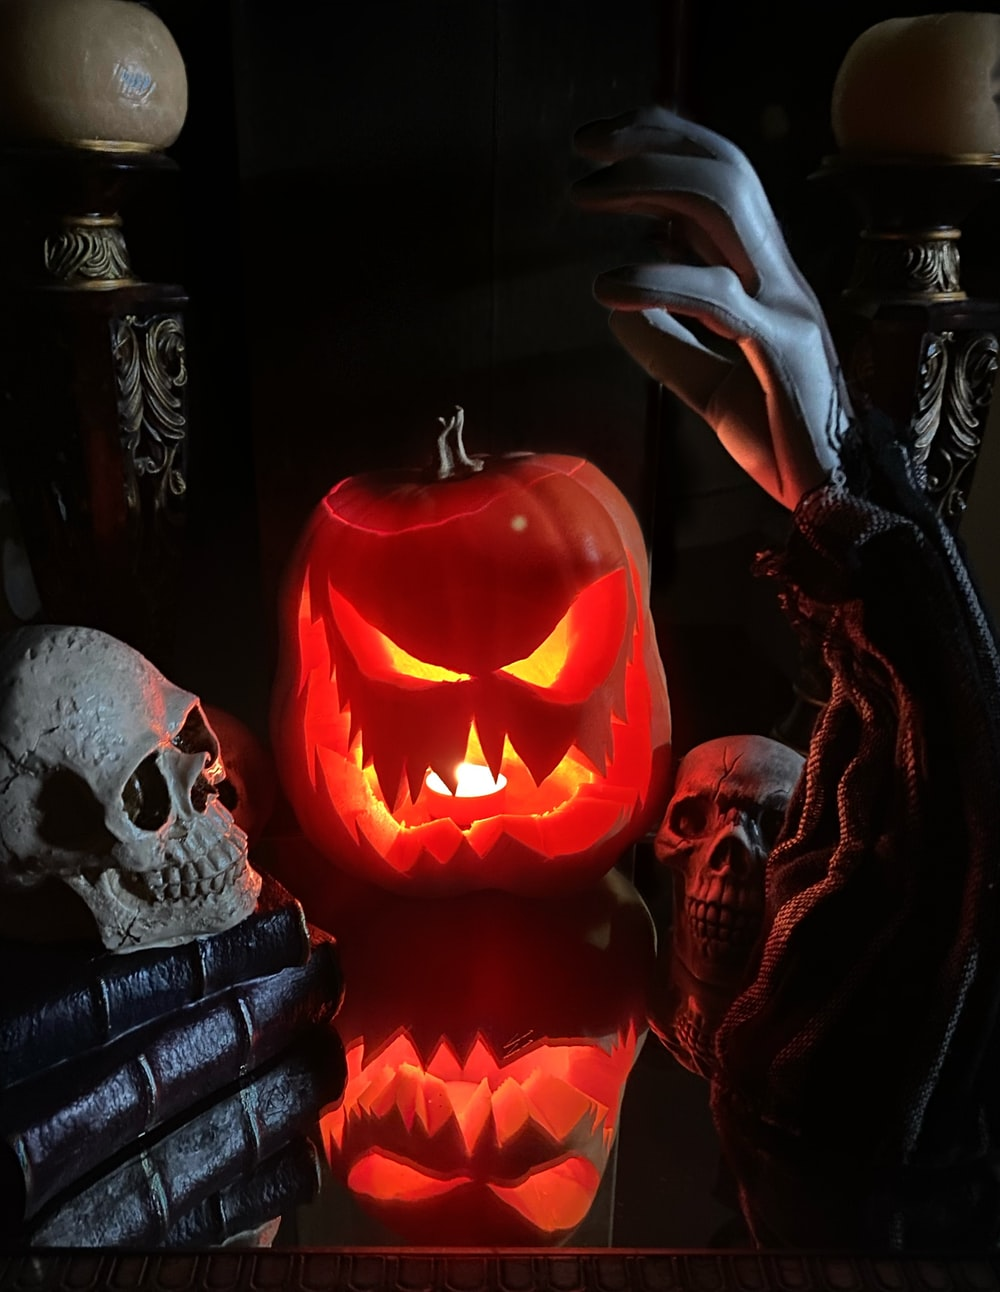 jack o lantern on black textile